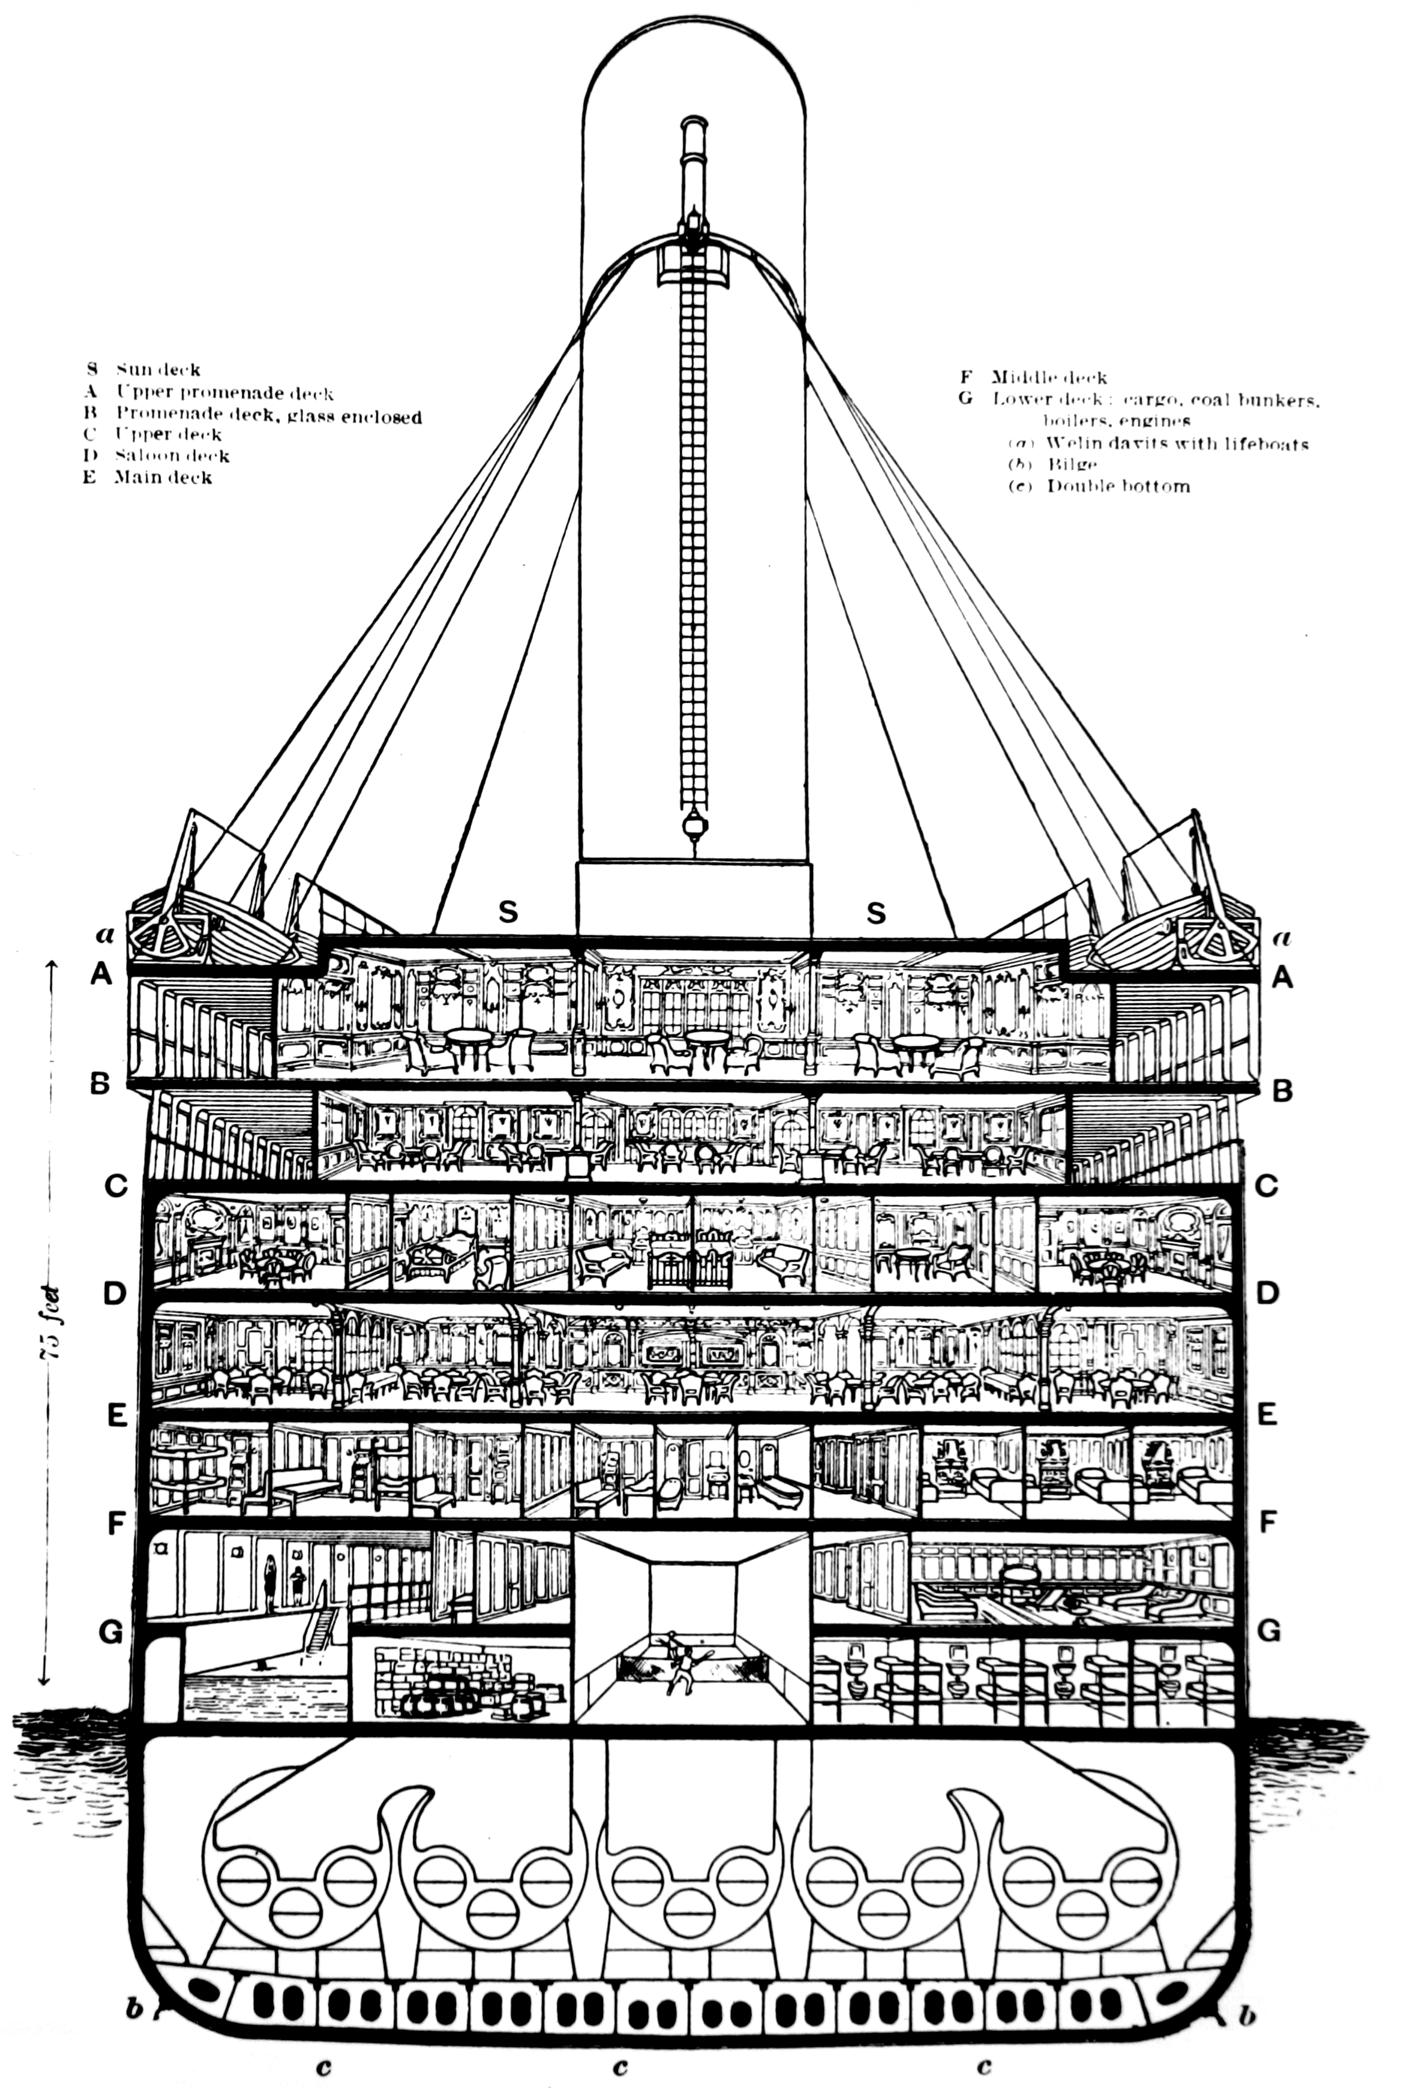 First class facilities of the Titanic   Wikipedia